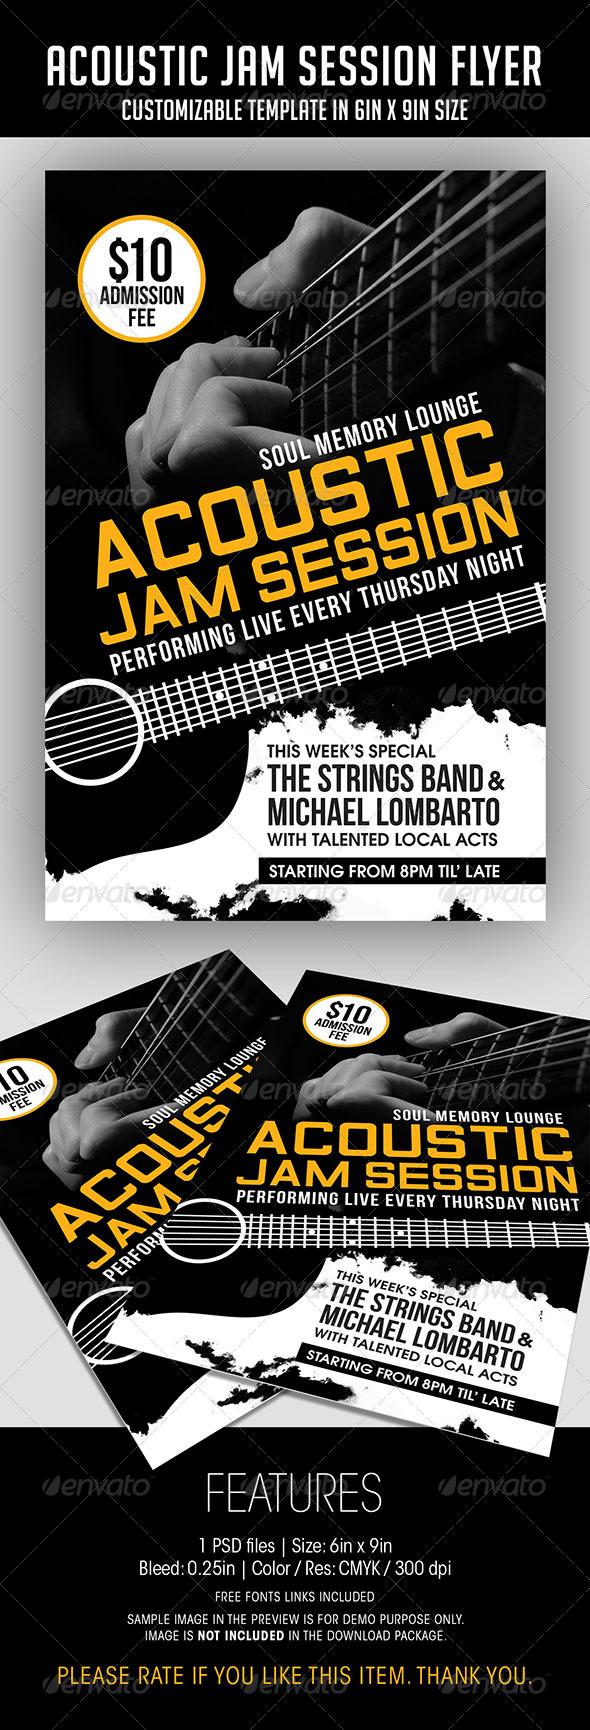 acoustic jam session flyer by soulmemoria graphicriver. Black Bedroom Furniture Sets. Home Design Ideas